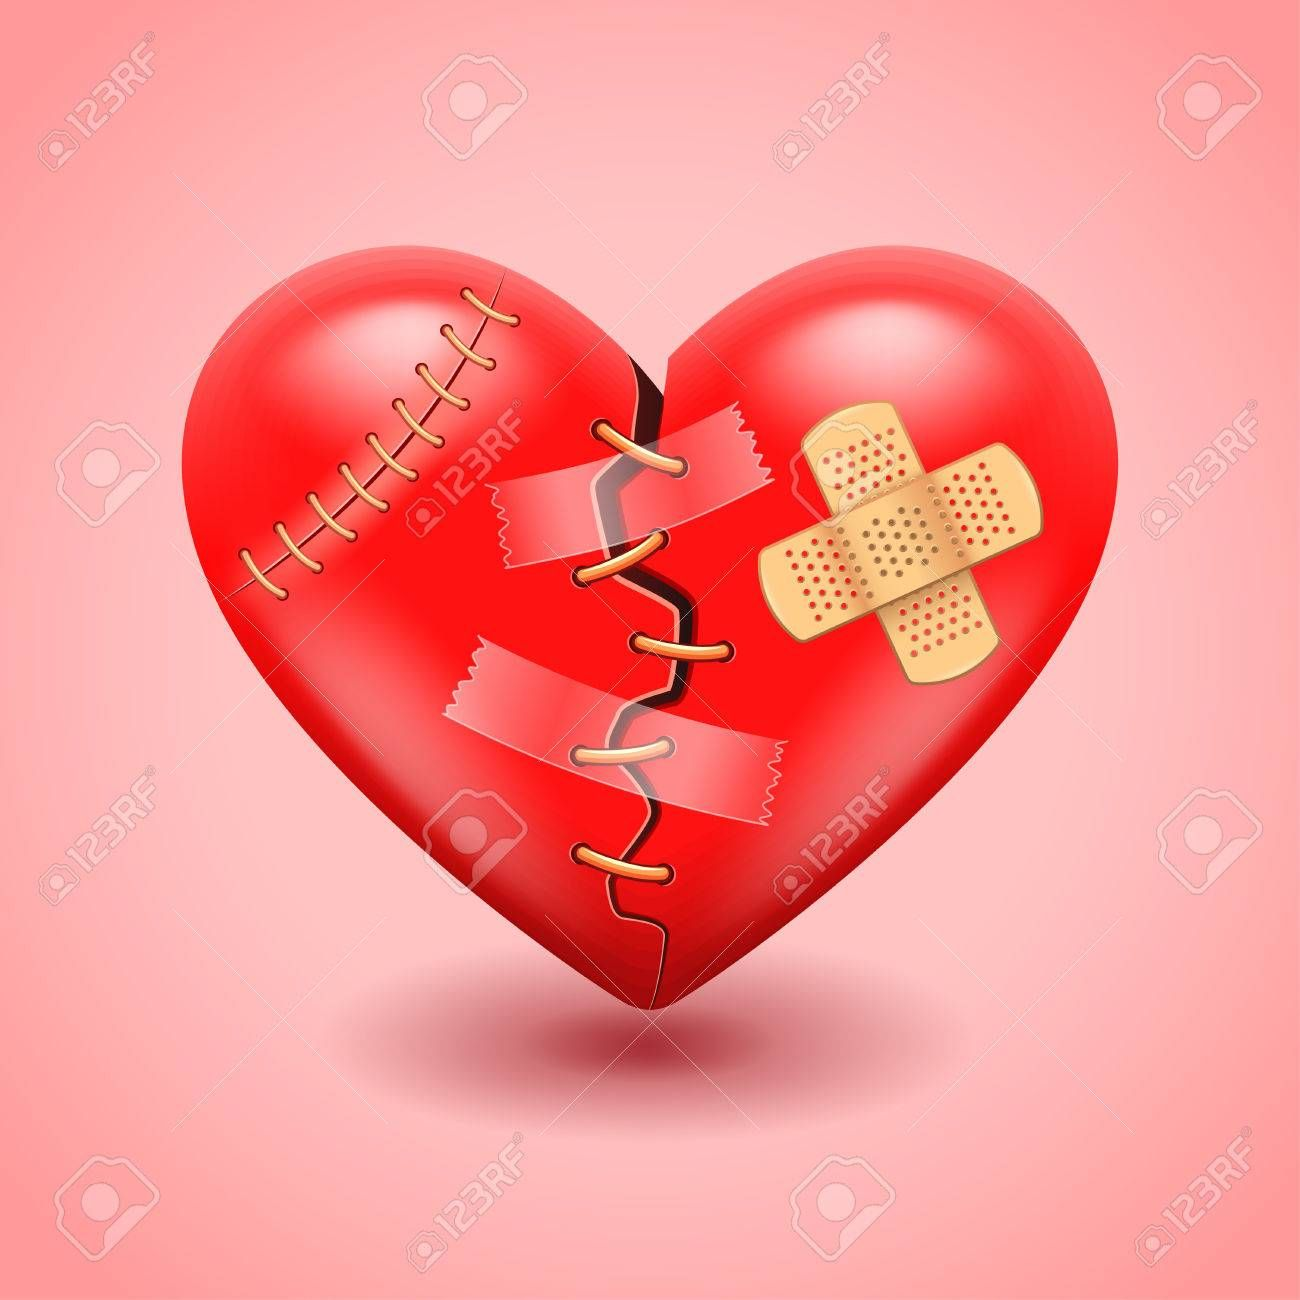 Big Broken Heart Photo Realistic Vector Background Ad Heart Broken Big Photo Background Broken Heart Photos Photo Heart Heart Background